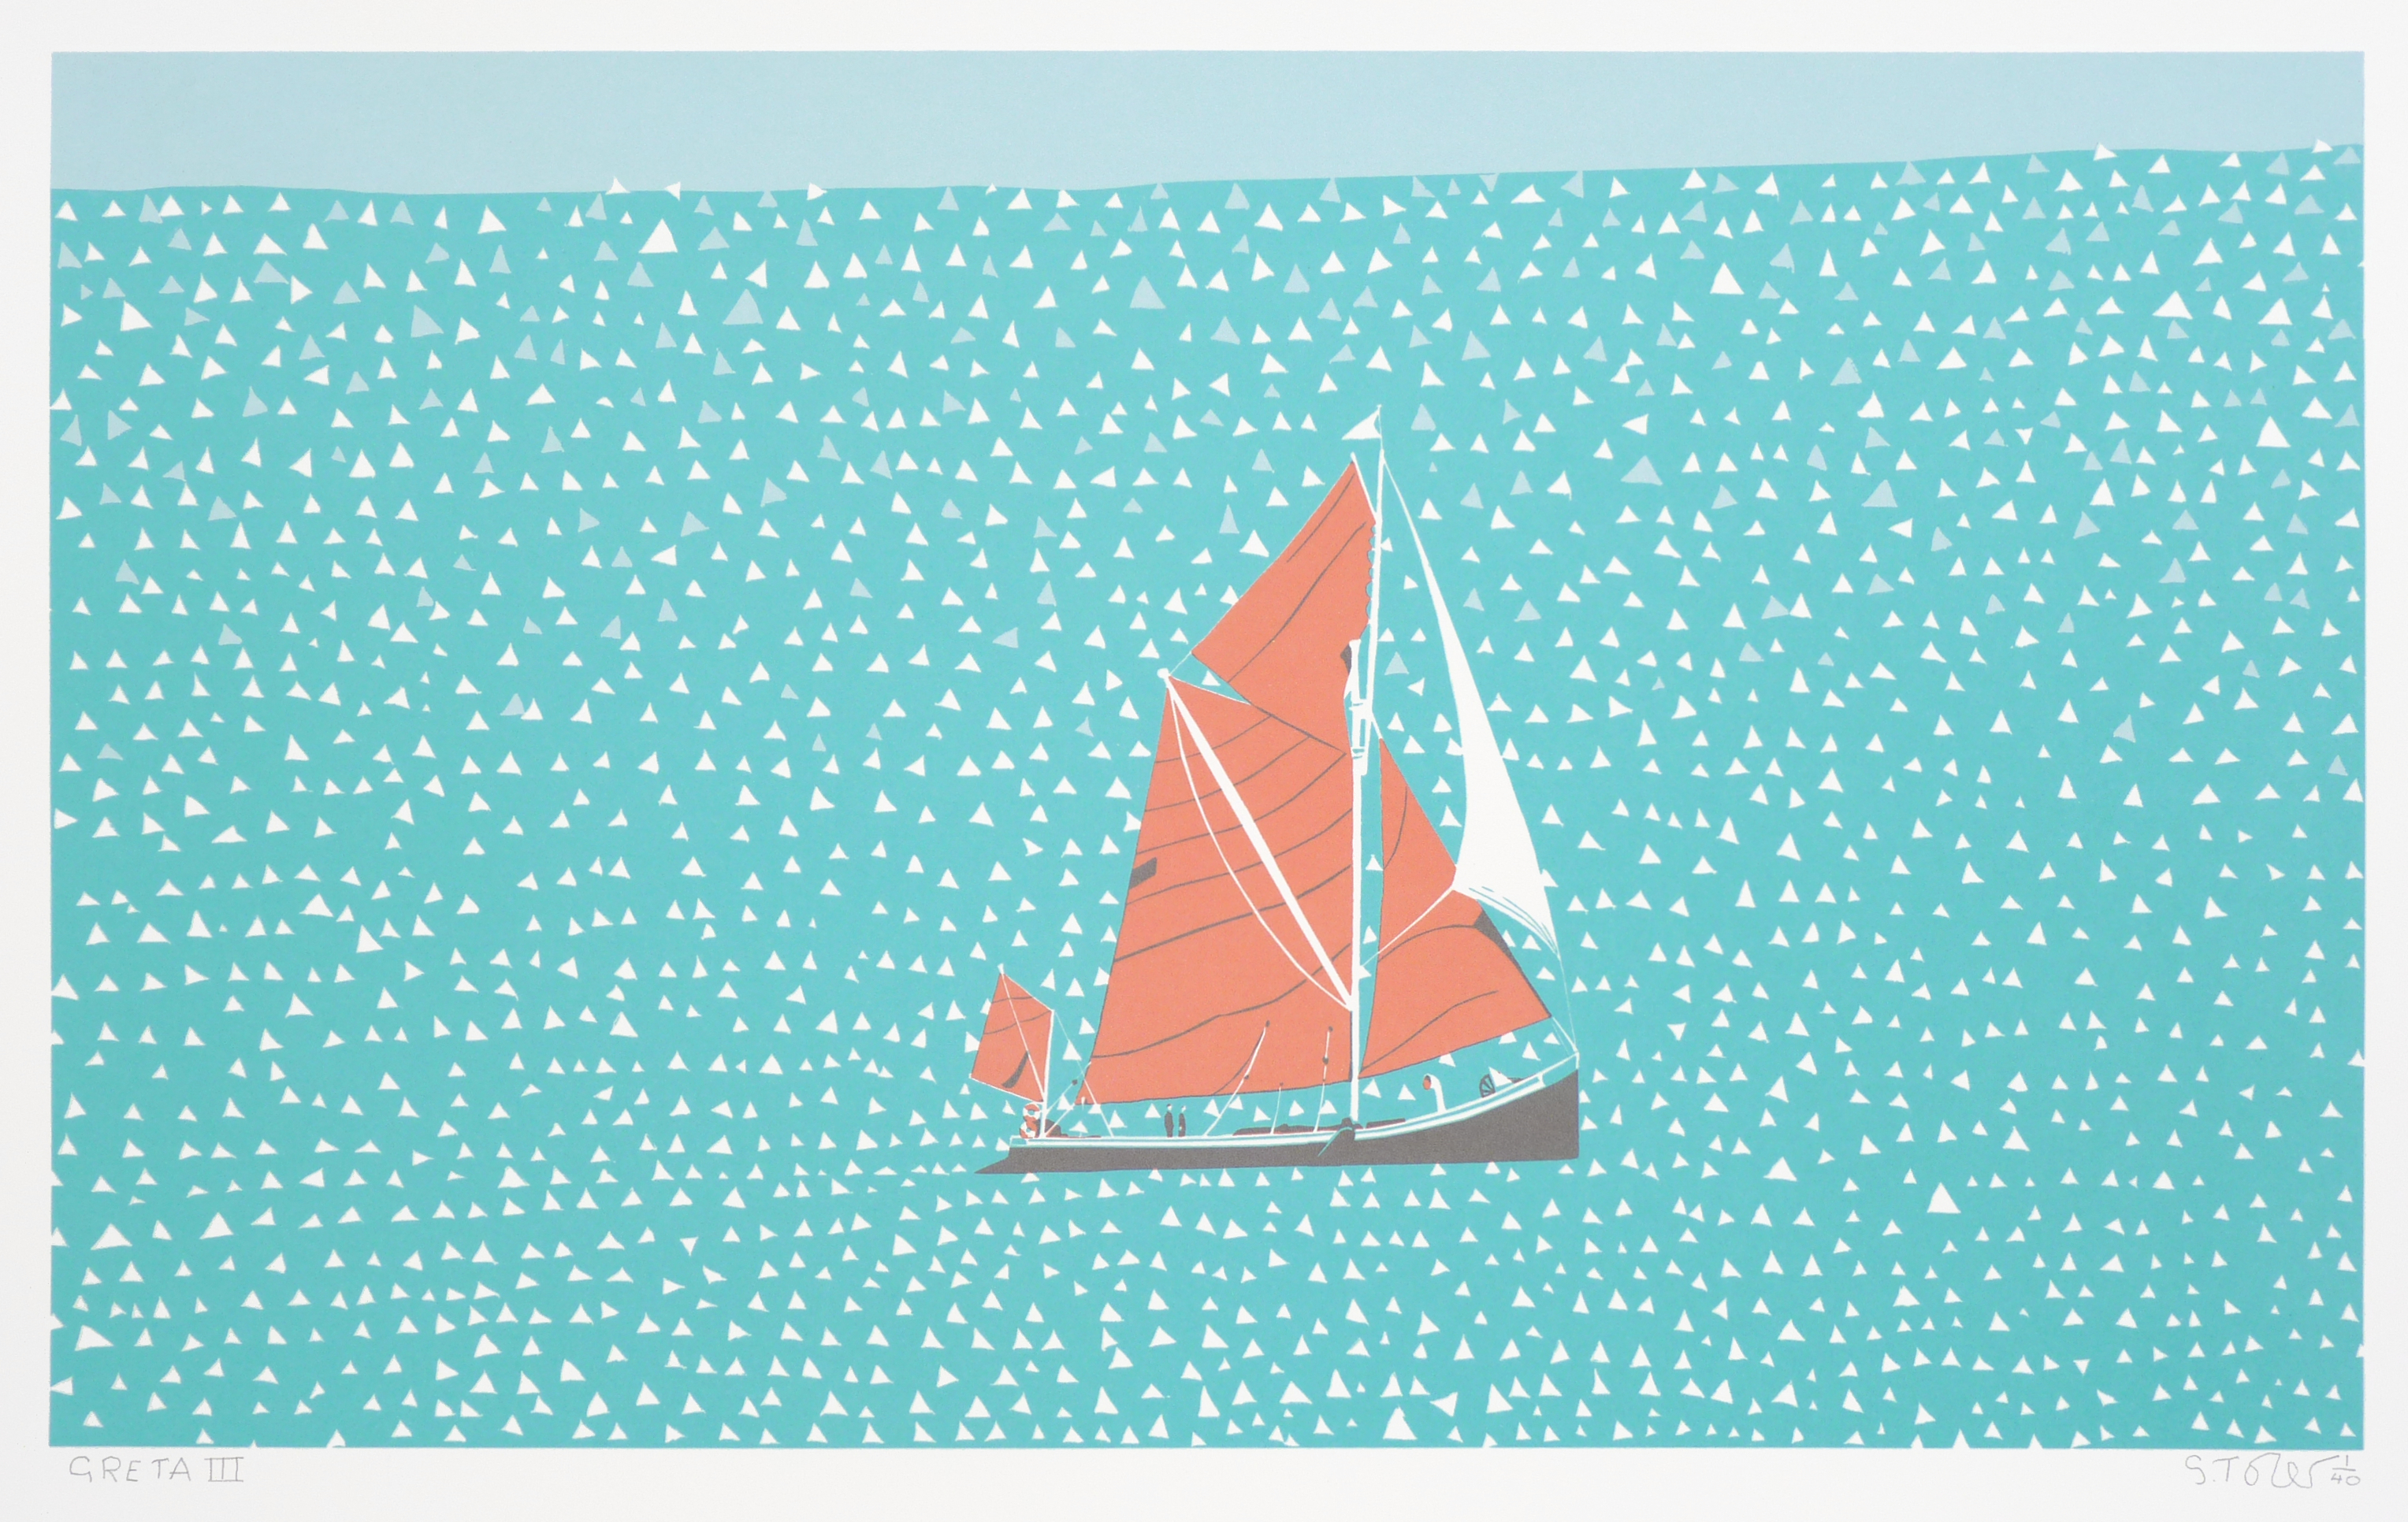 greta simon tozer artist boat painting seascape